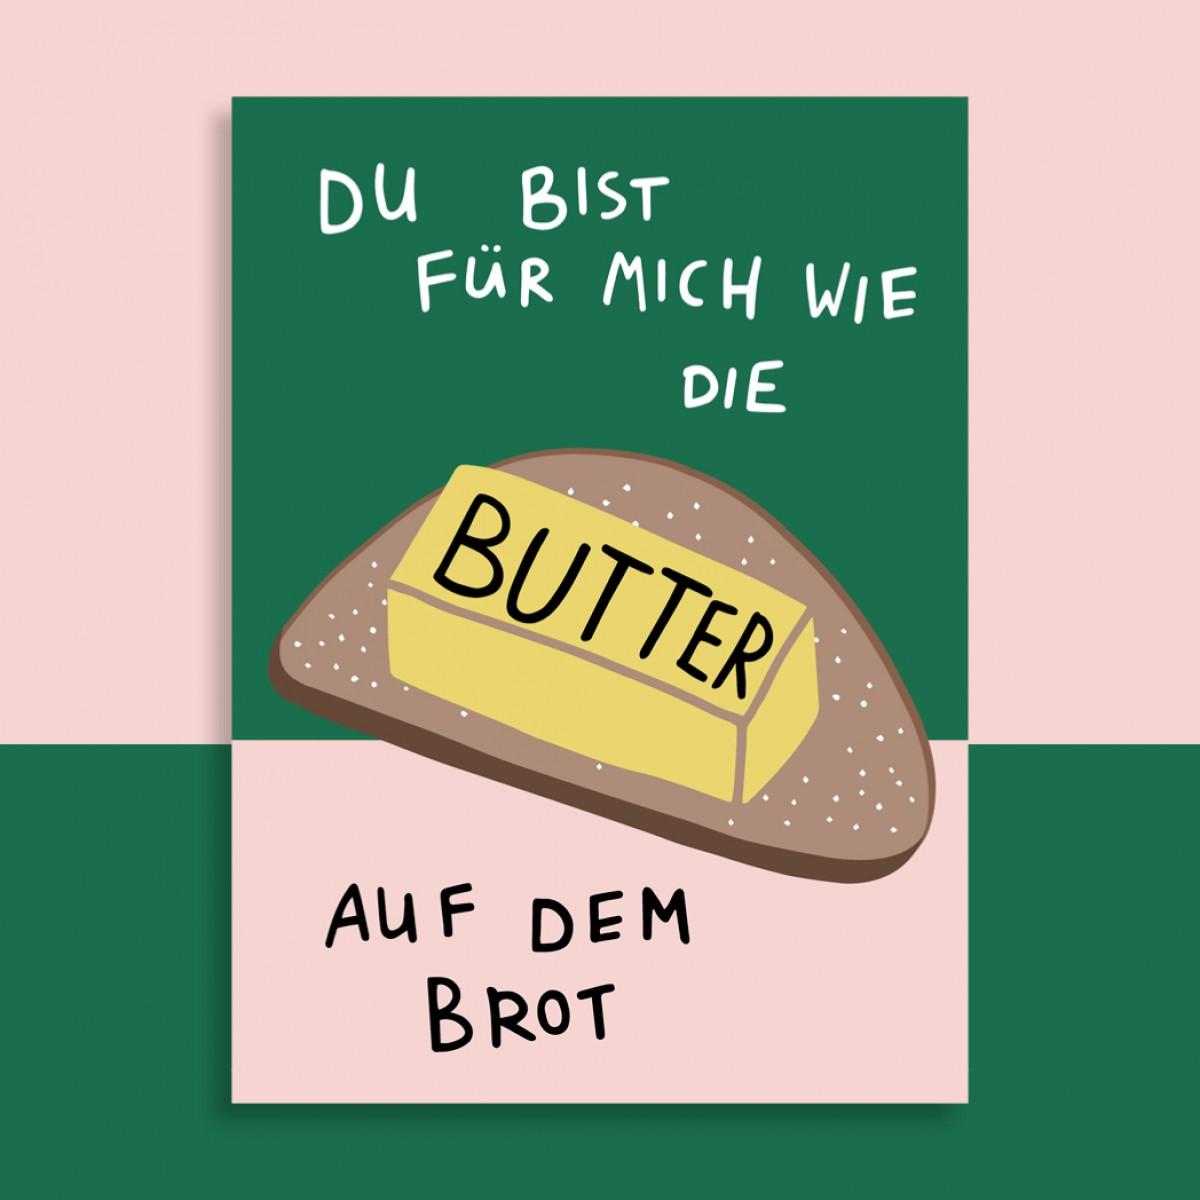 Family Tree Shop / Postkarte / Die Butter auf dem Brot